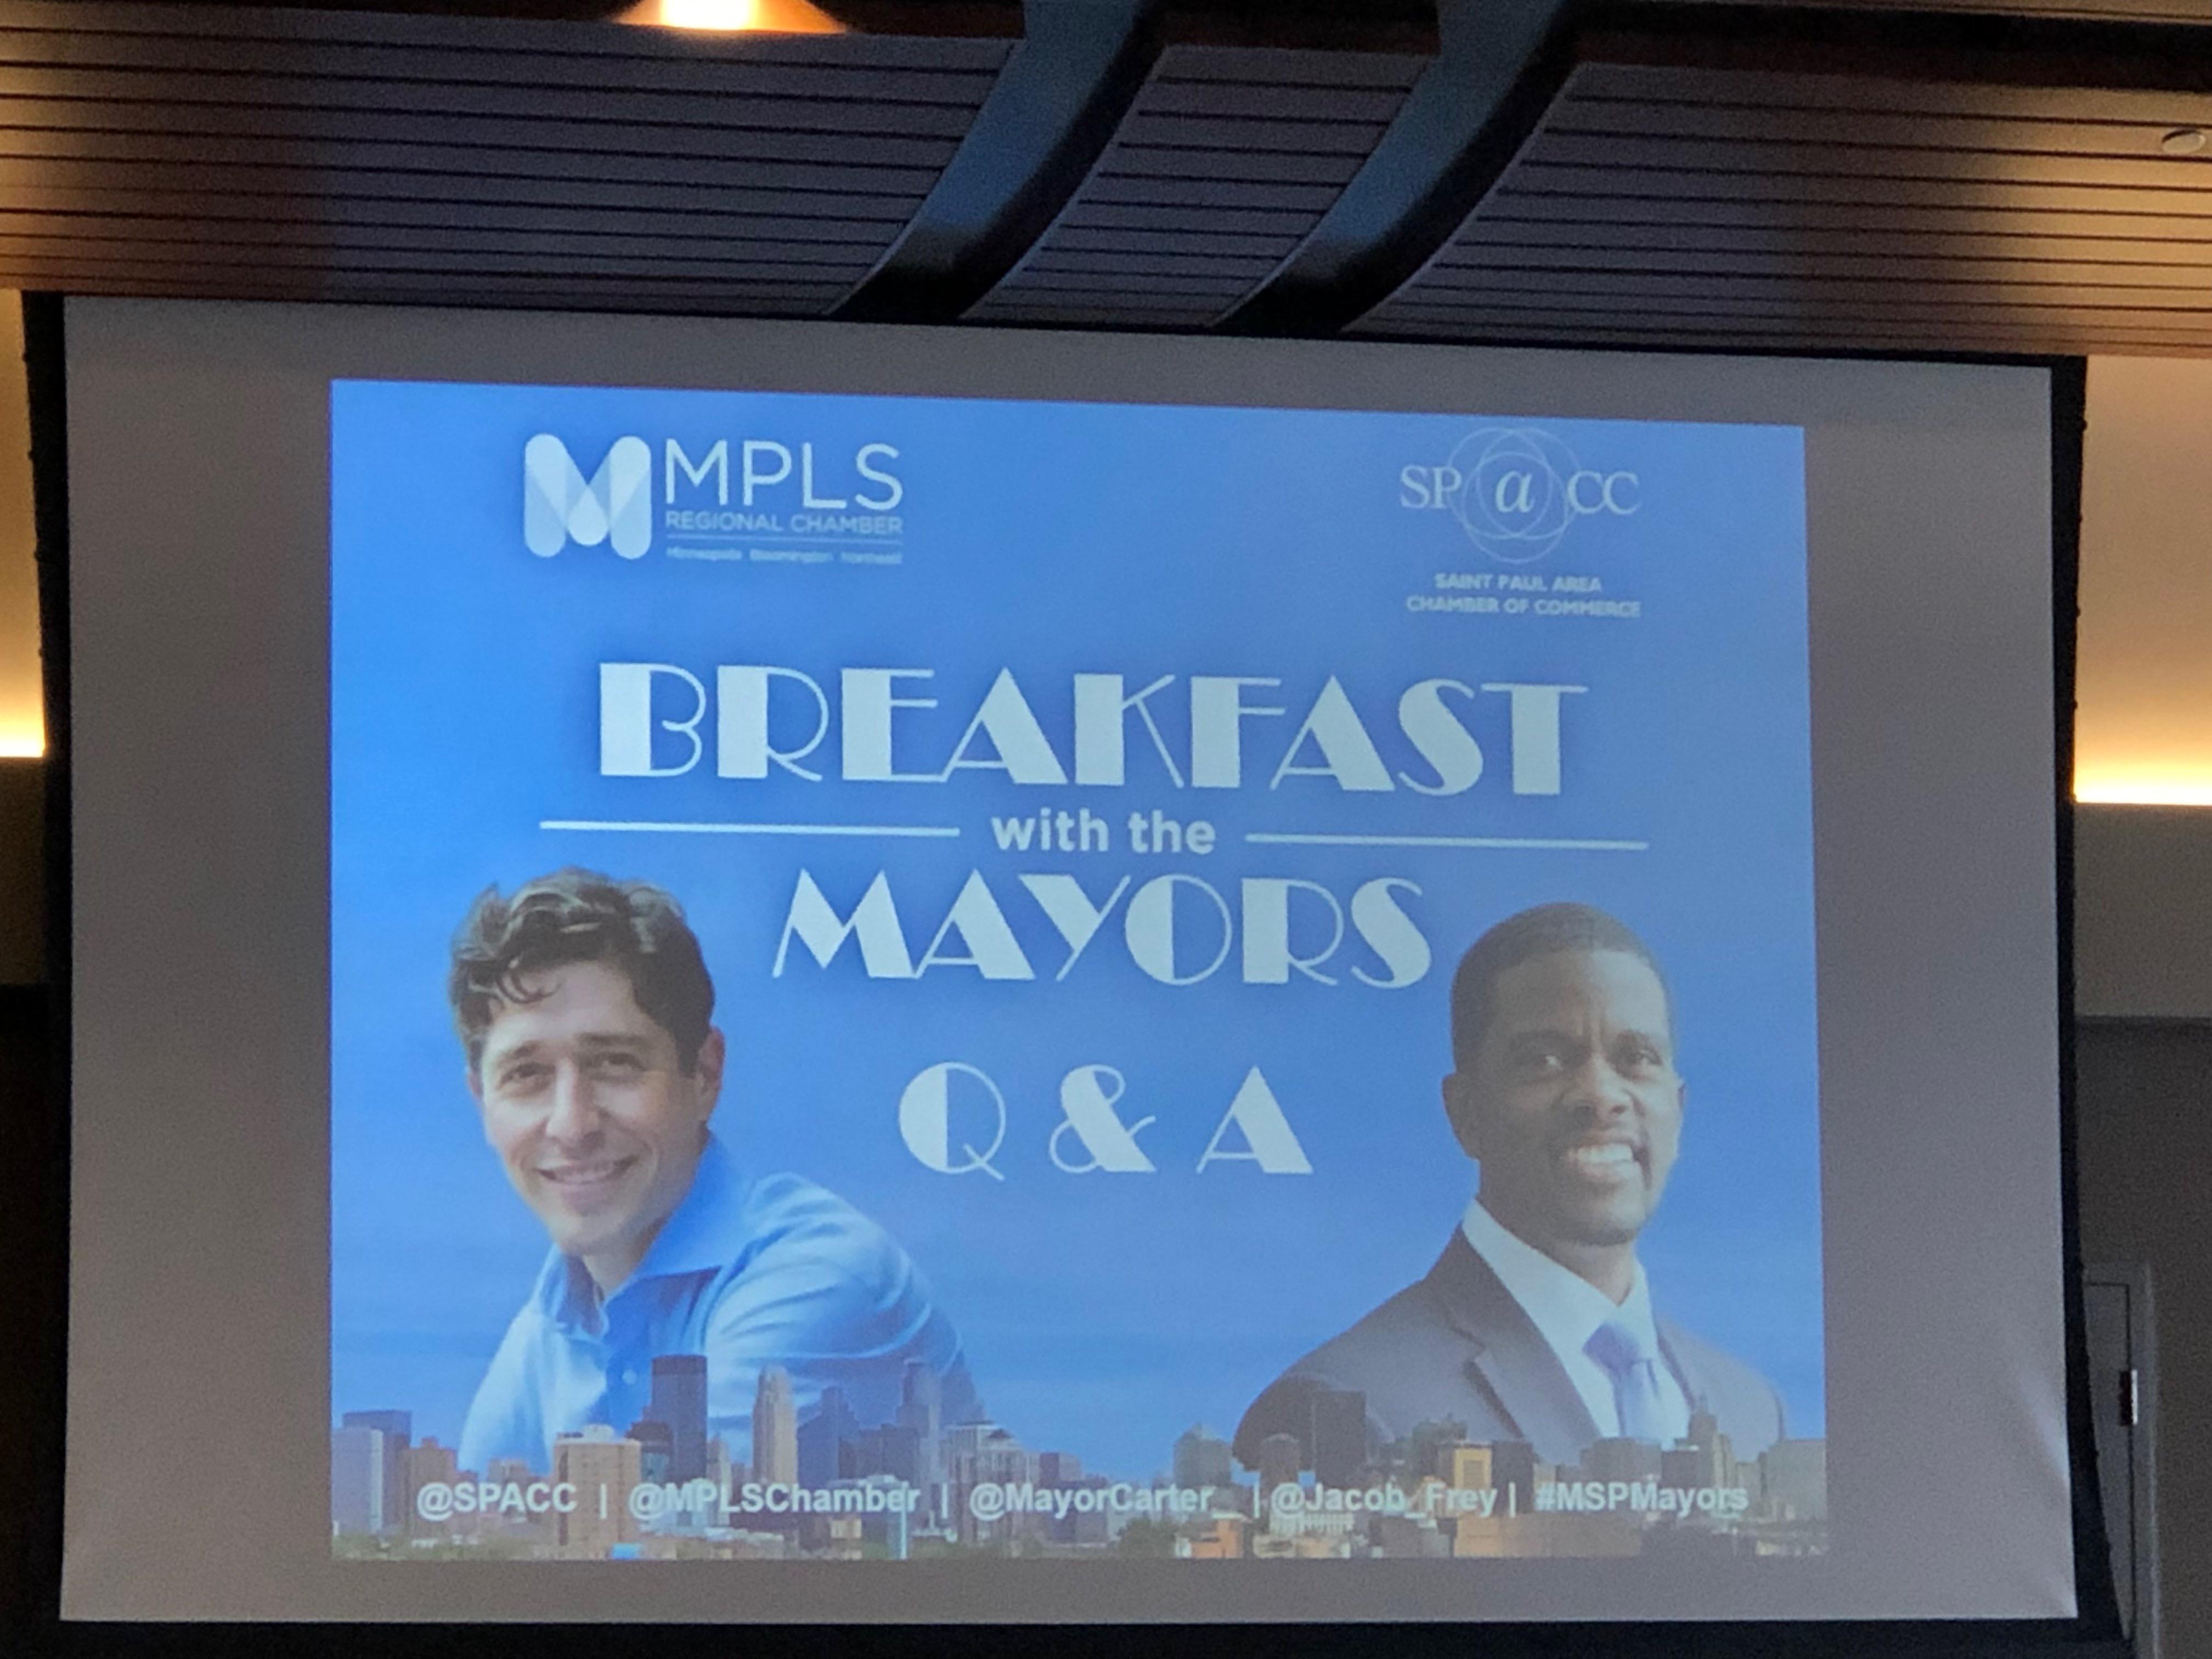 January 2019 Breakfast with the Mayors